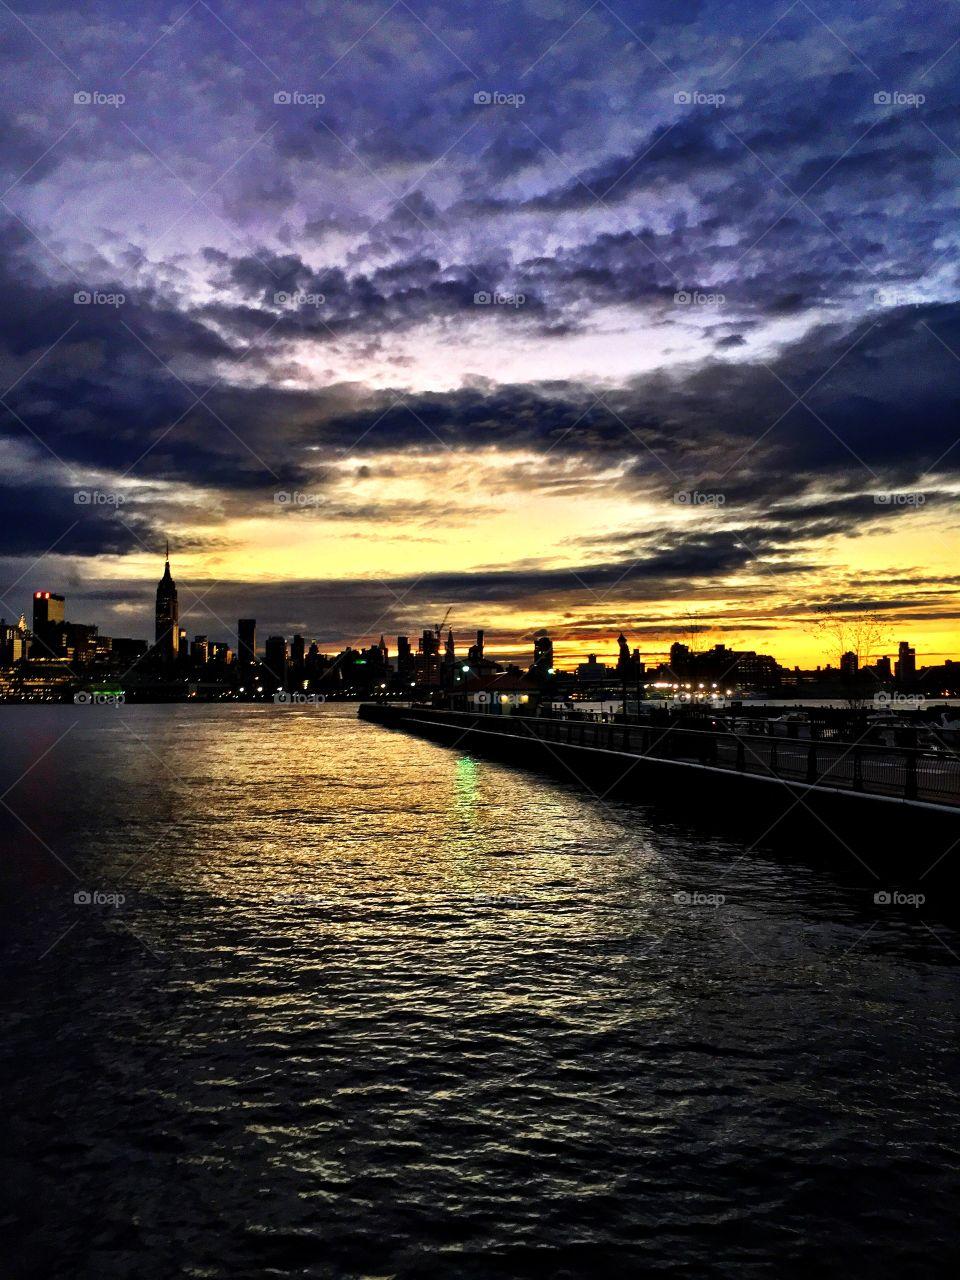 New York City skyline at sunrise with purple skies.. New York City skyline at sunrise with purple skies. Hudson River view,